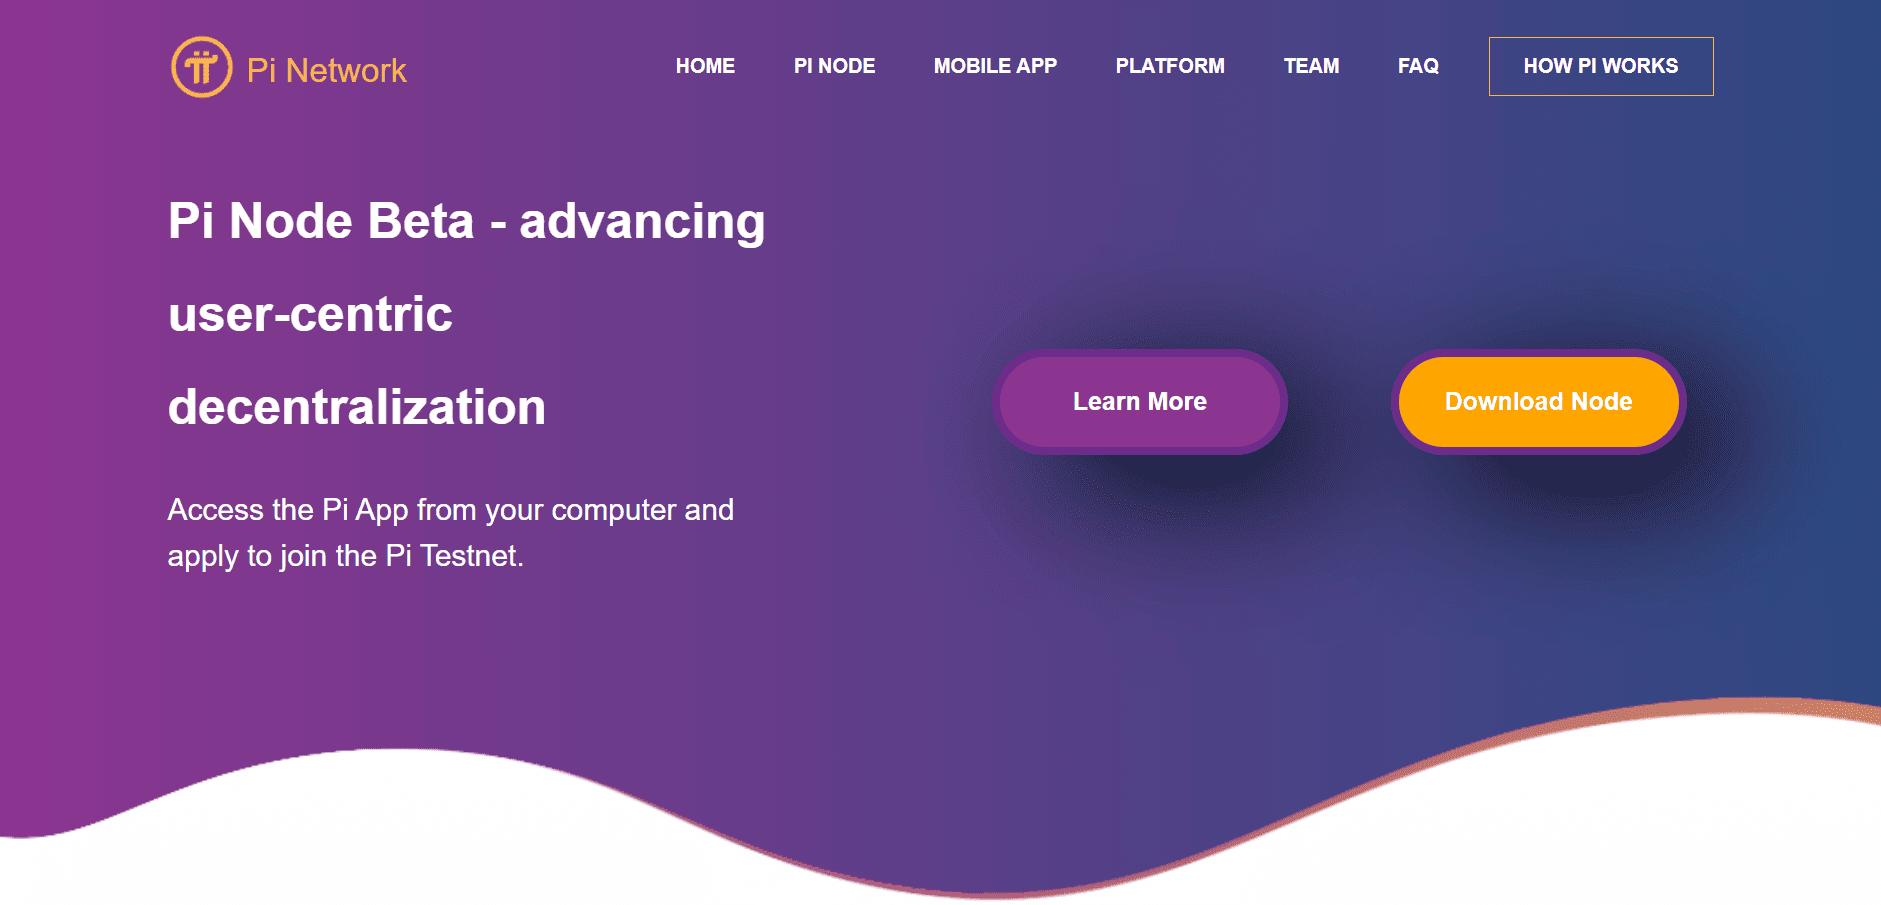 صفحة برنامج Pi Node